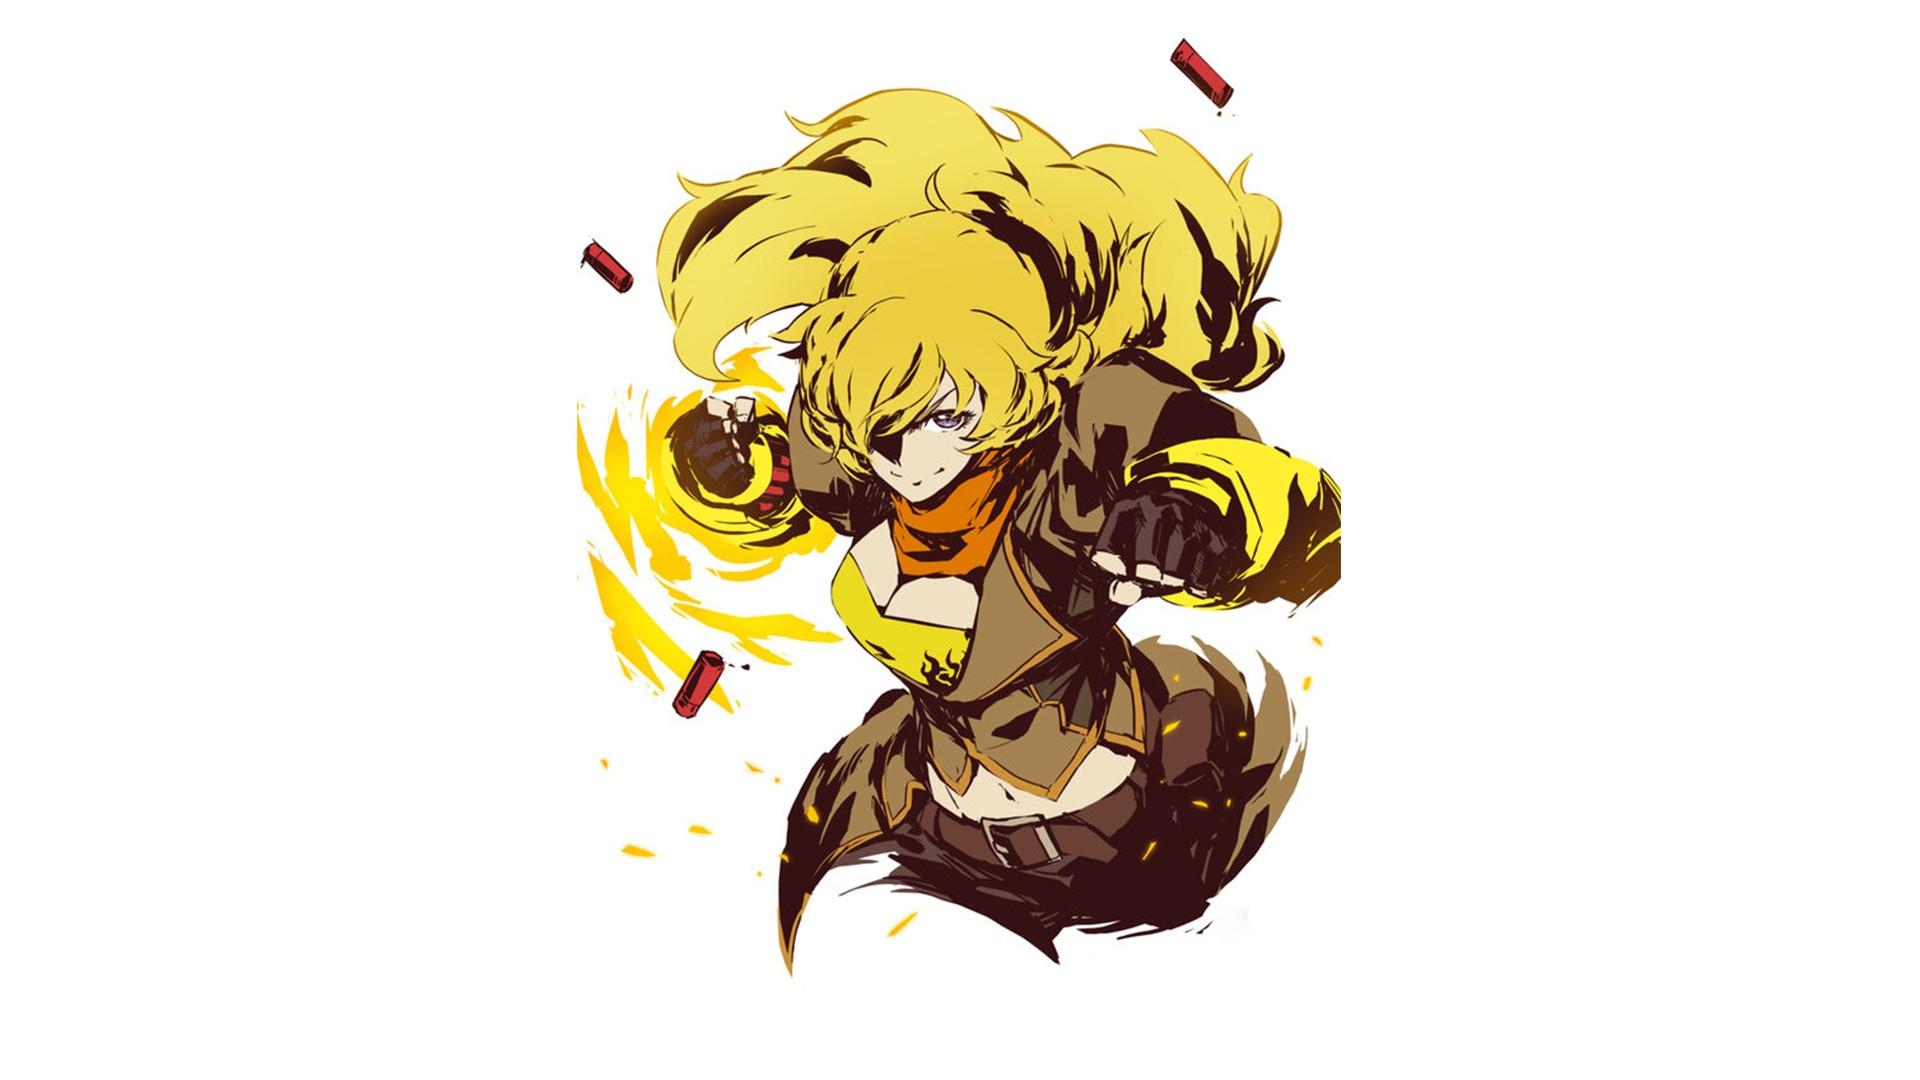 Wallpaper Drawing Illustration Anime Cartoon Rwby